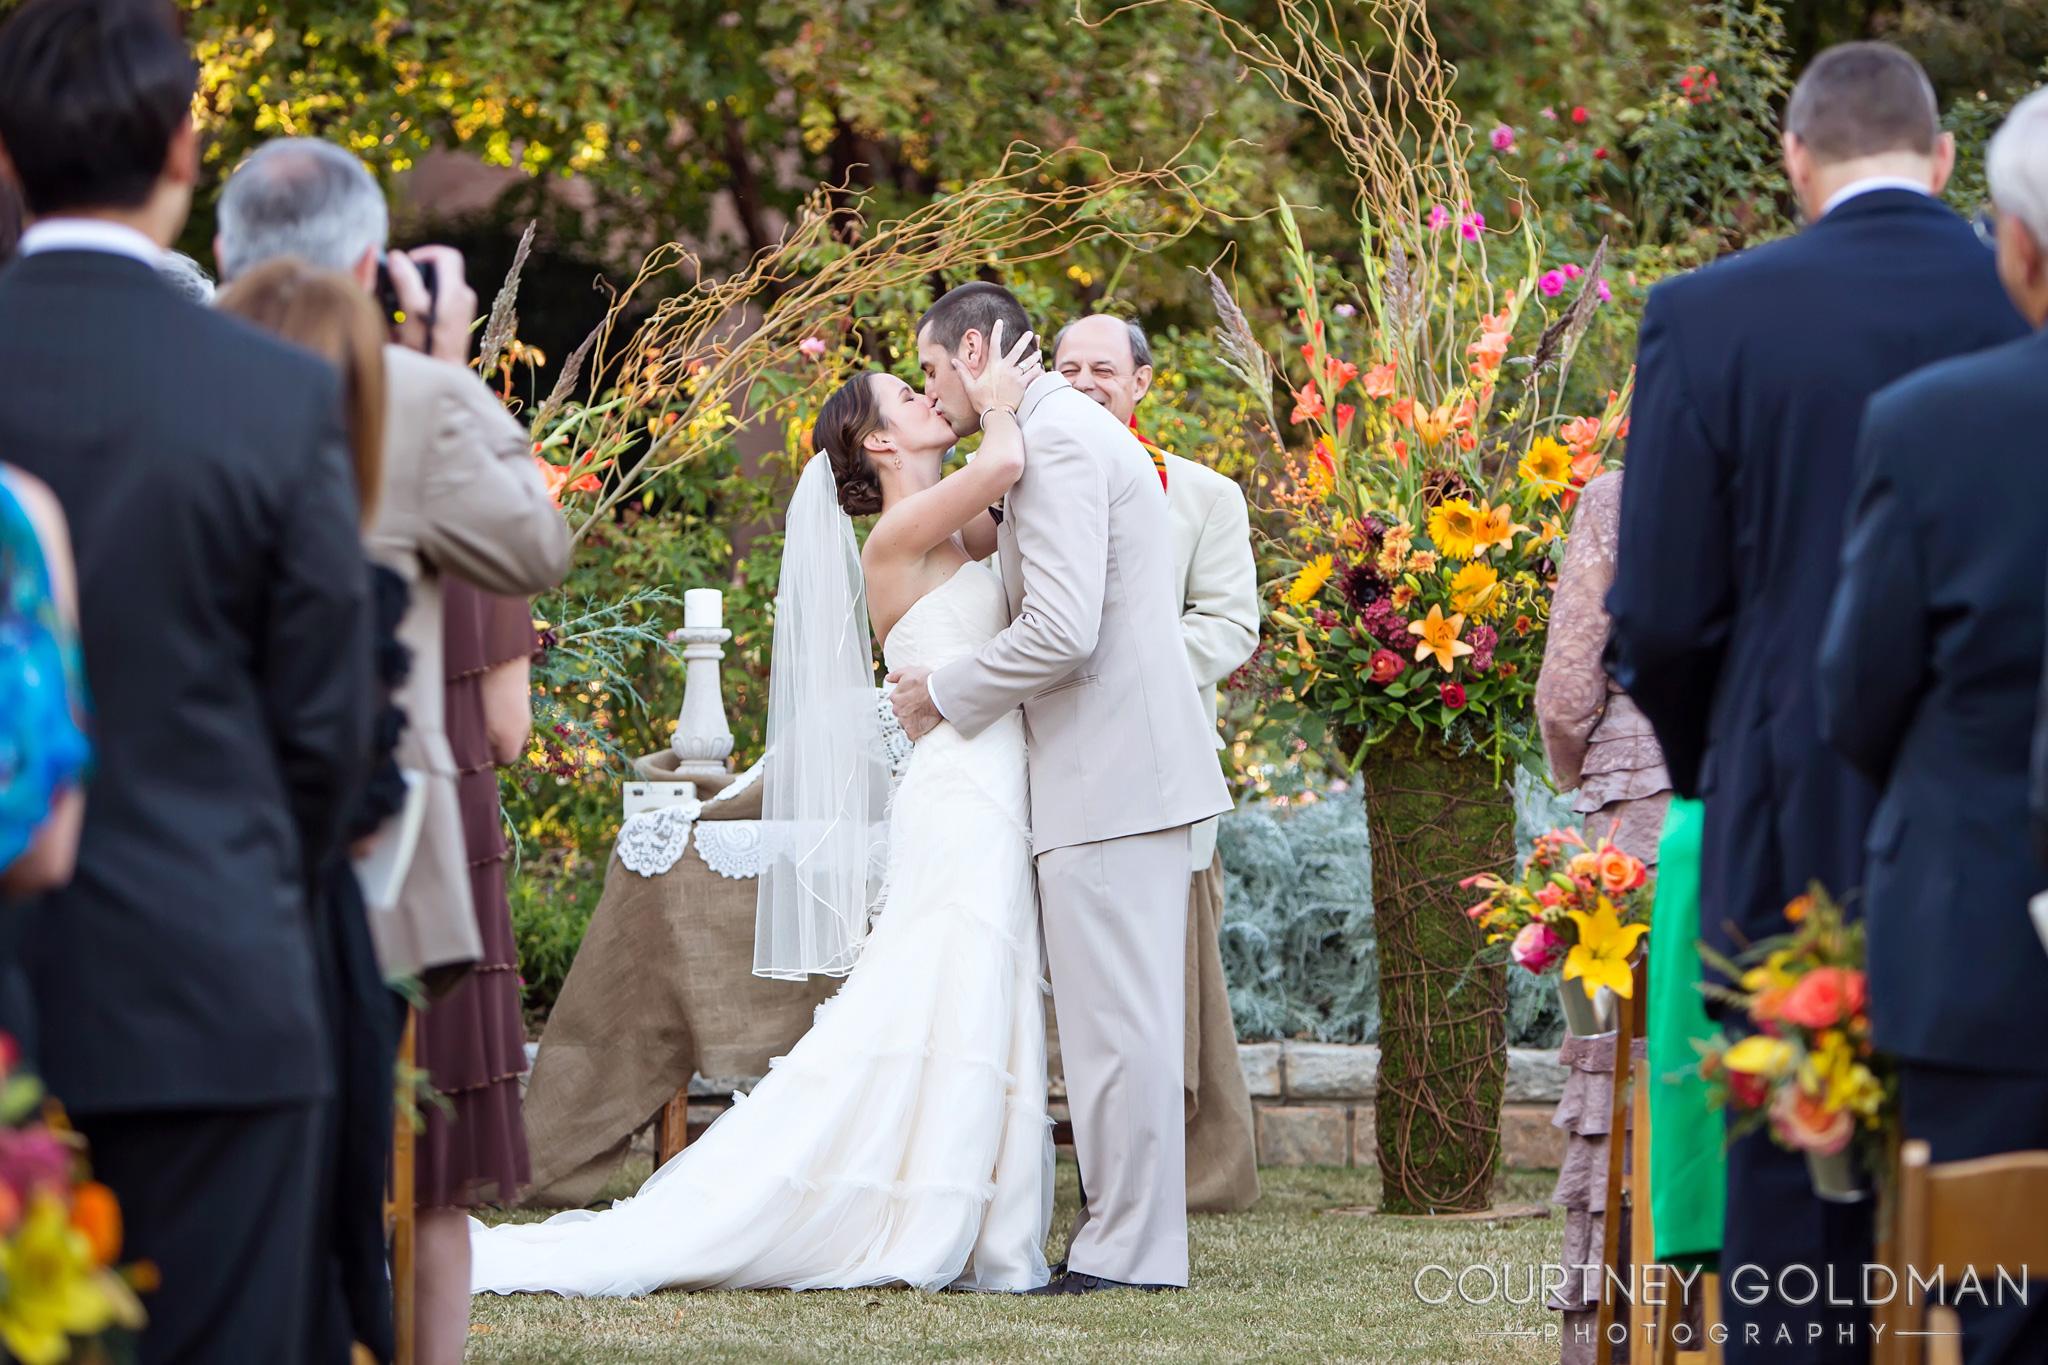 004-Atlanta-Wedding-Photography-by-Coutney-Goldman.jpg